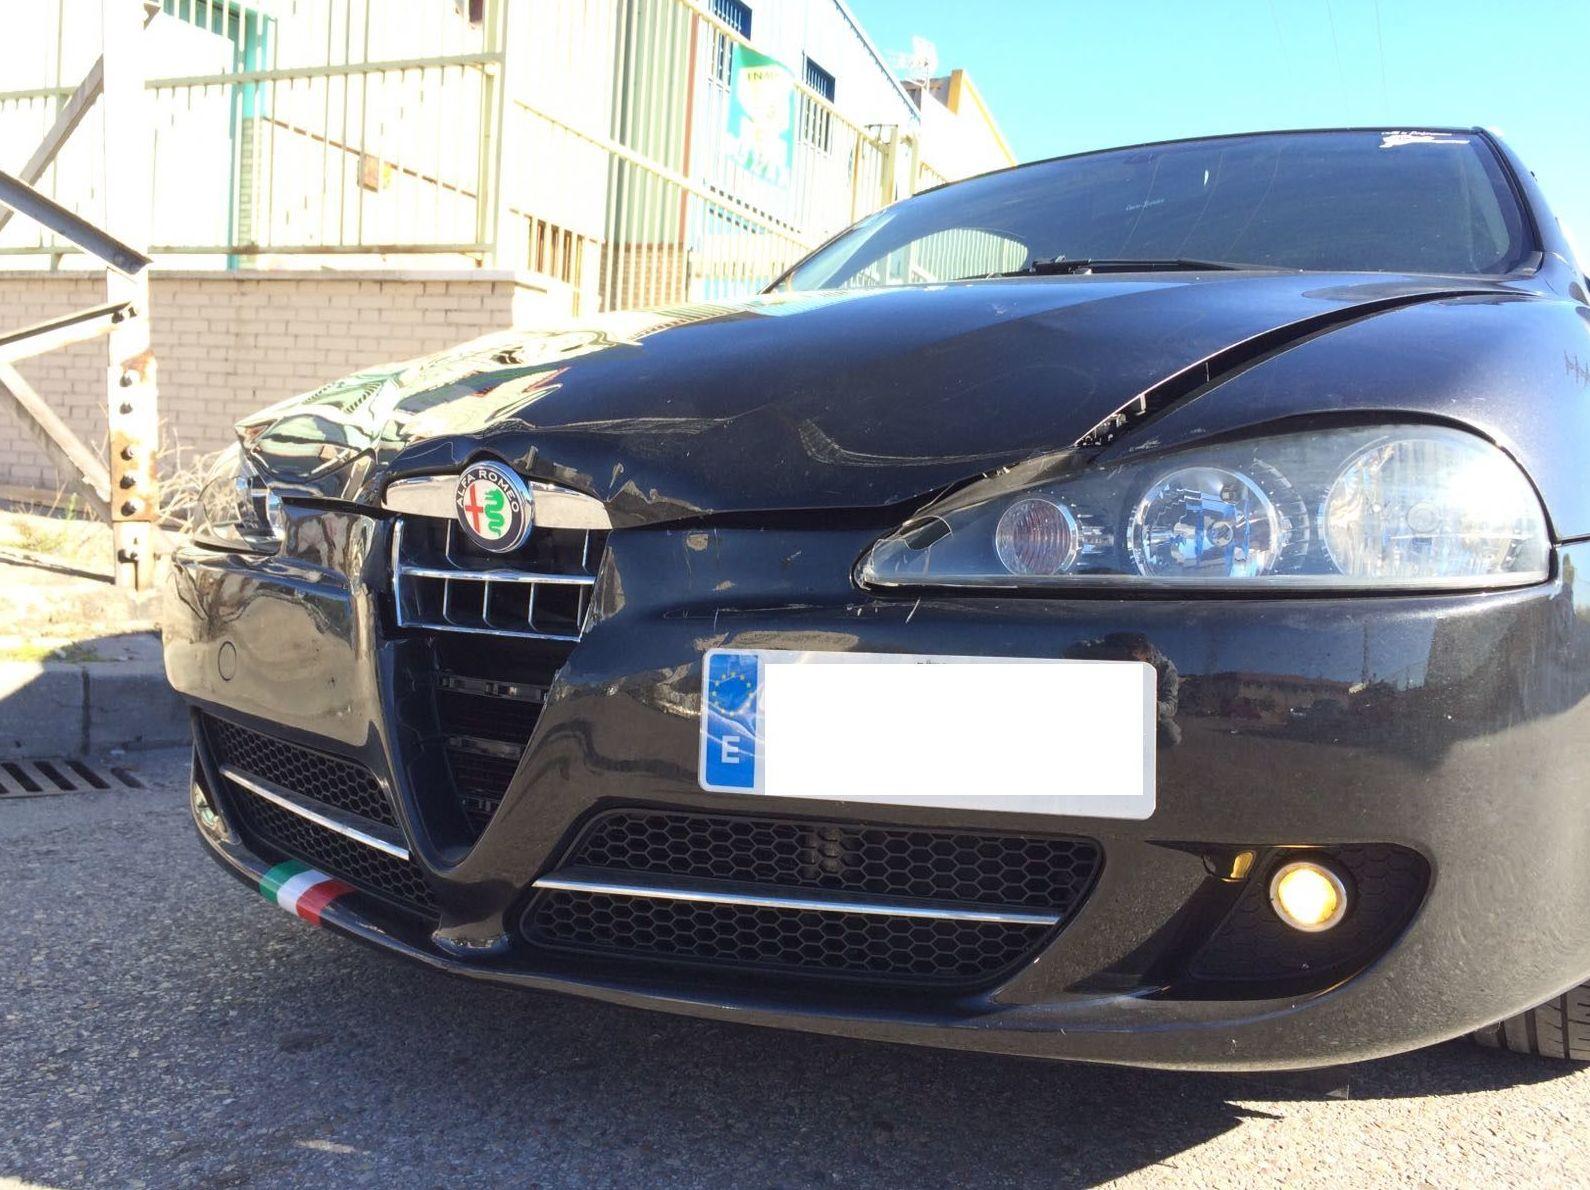 Reparación Alfa Romeo: Servicios de Legauto Motor